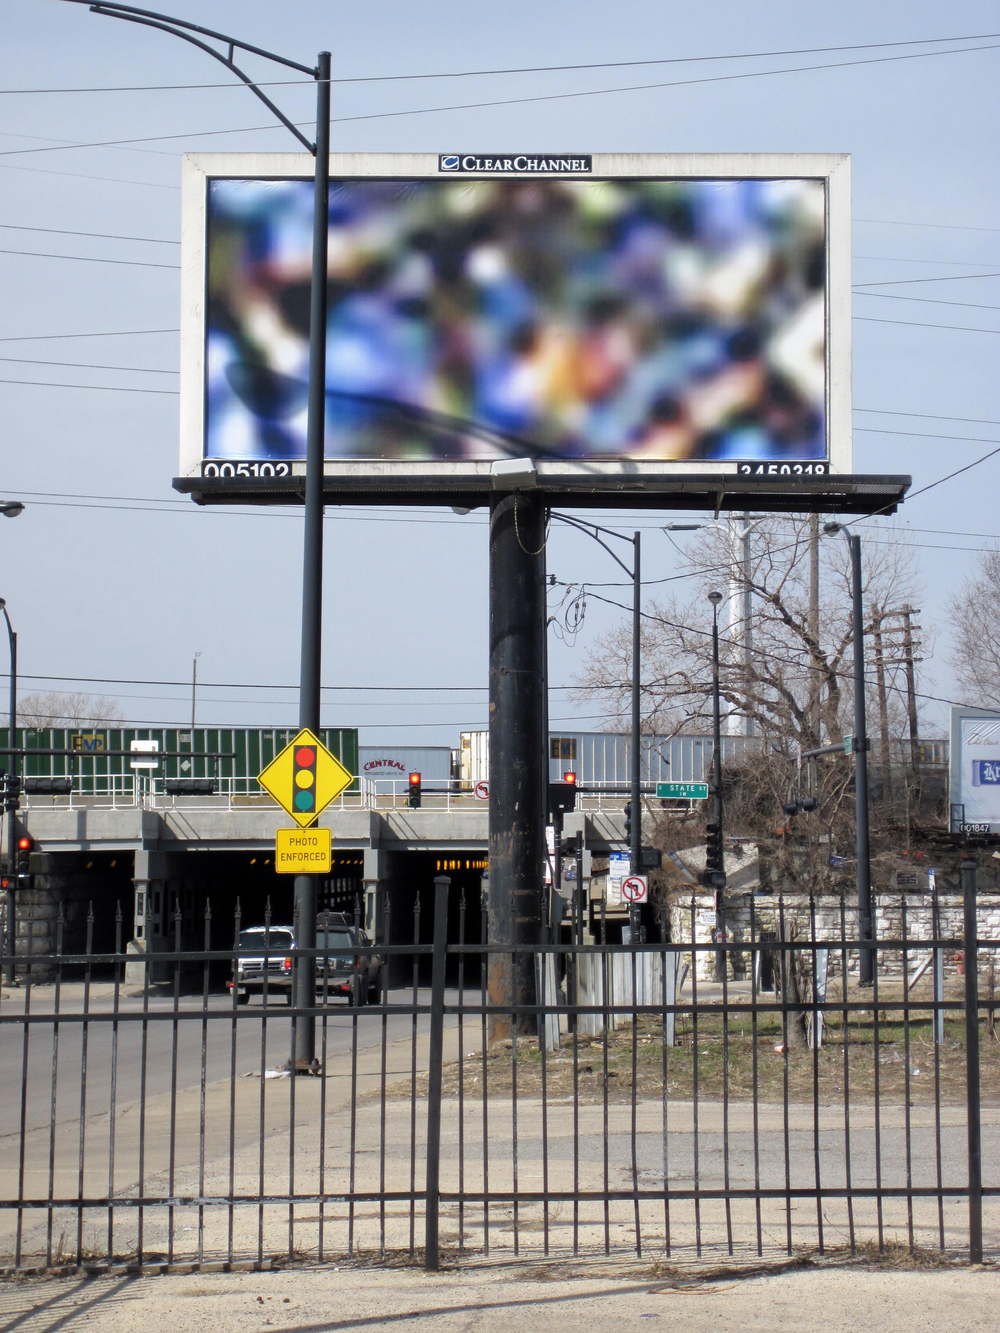 Three Billboards / 63rd & State St. / Chicago